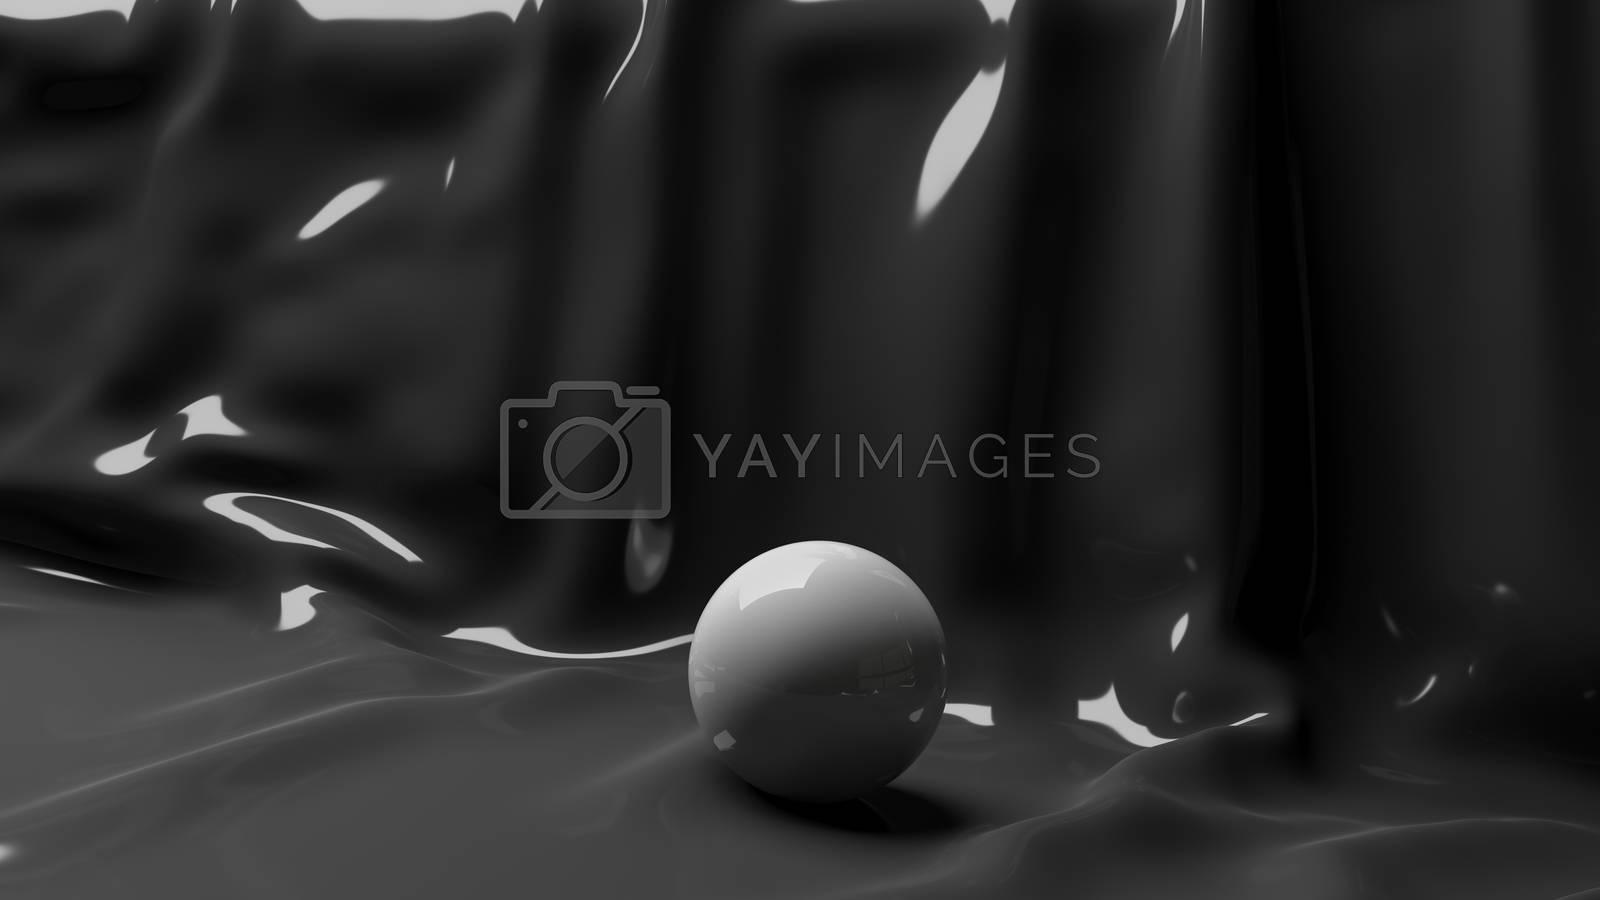 3d Illustration Brilliant White Ball on a Black Background